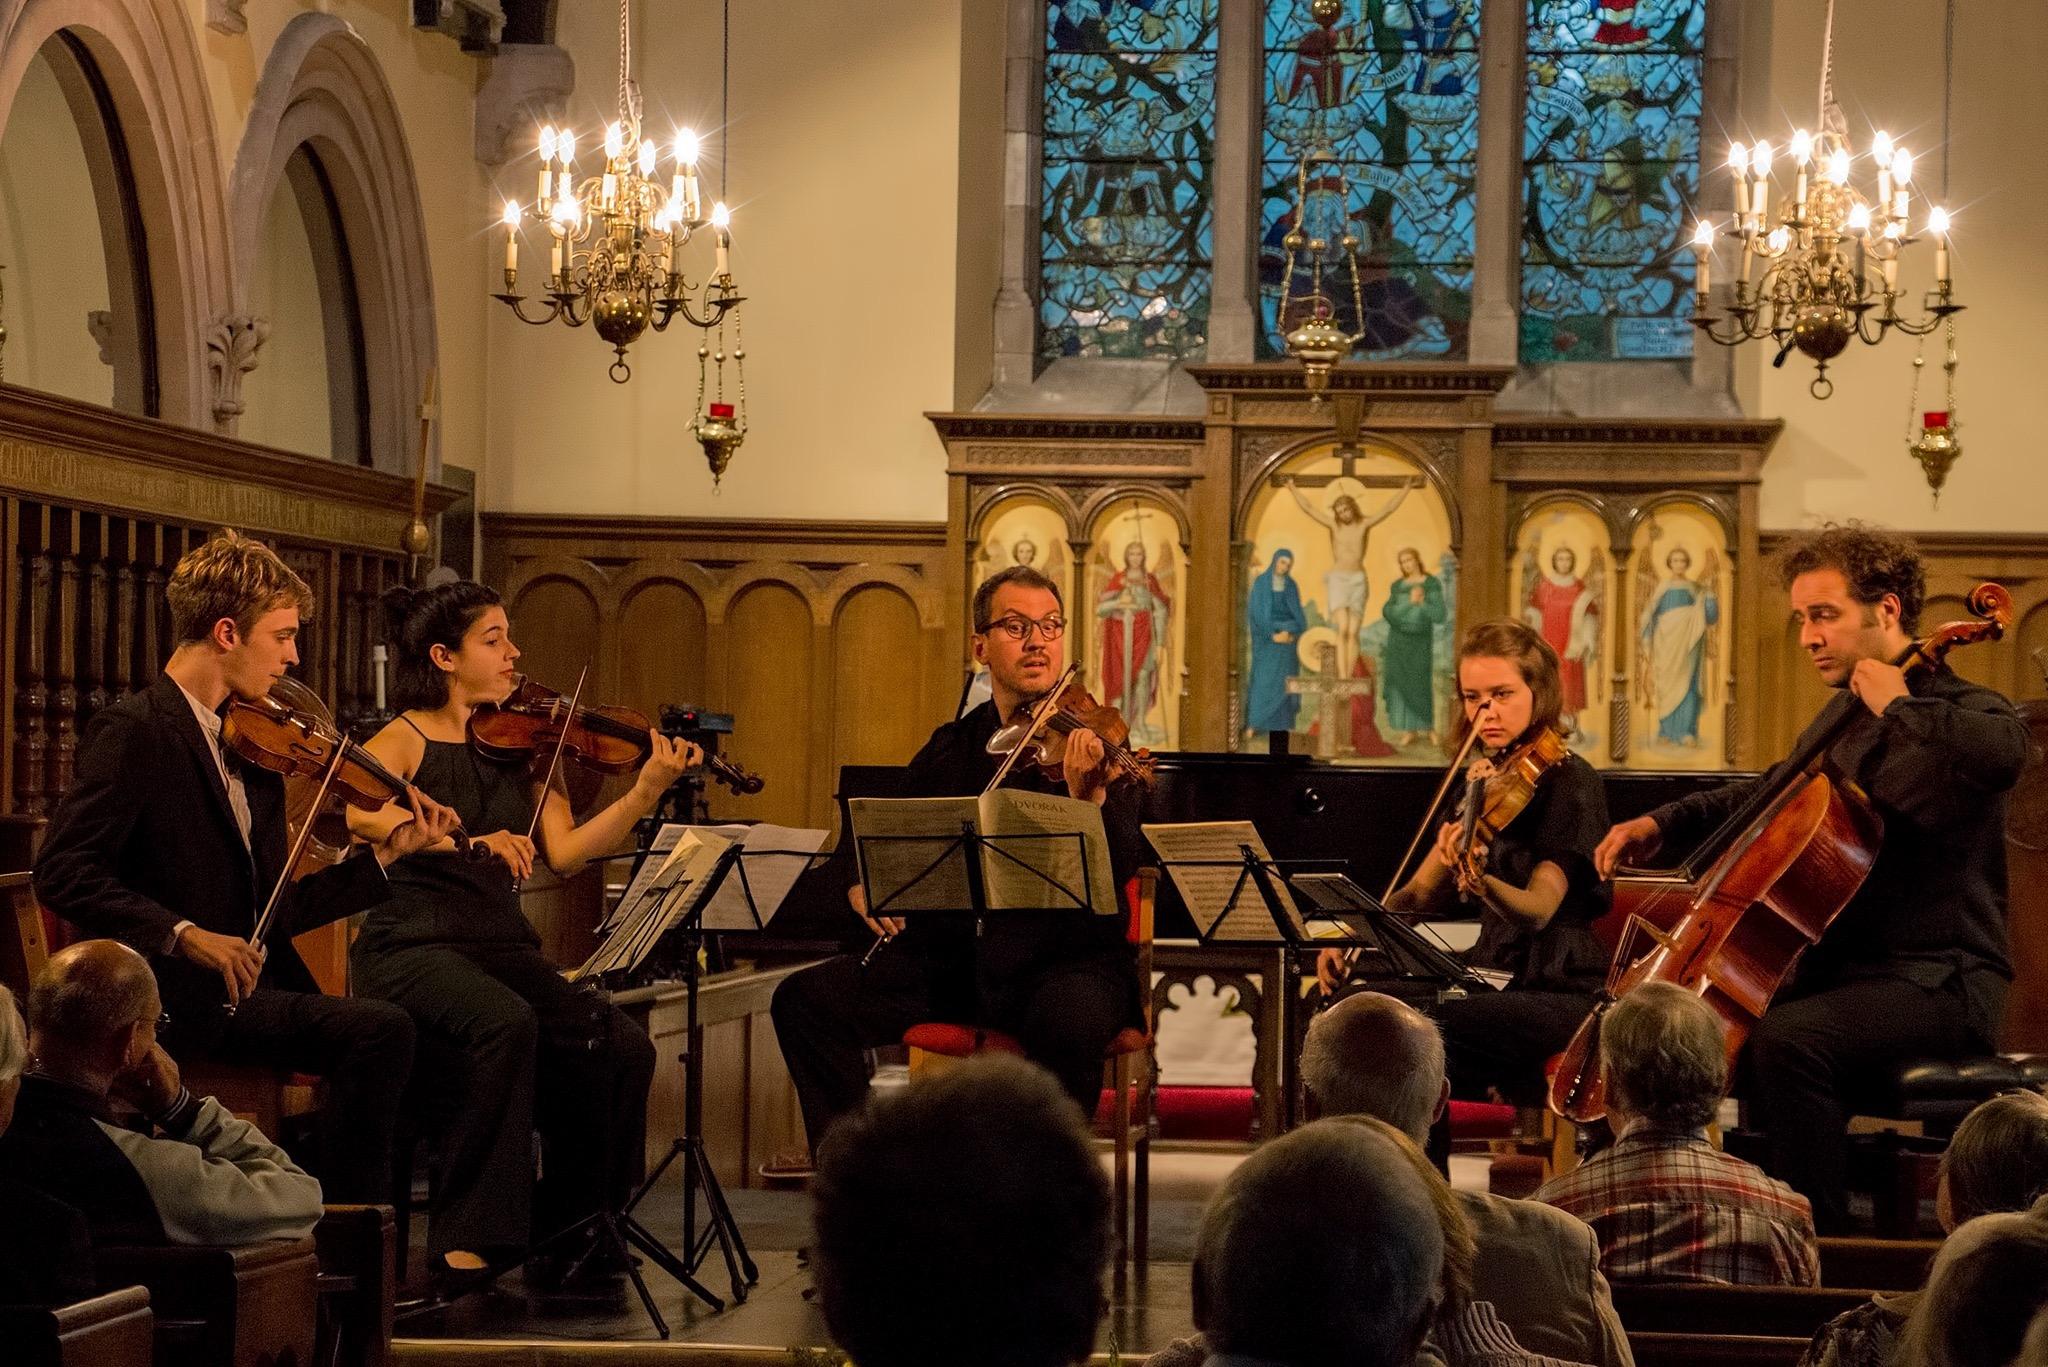 Dvorak E flat Major String Quintet Op.97 with Tim Crawford, Maia Cabeza, Francis Kefford, Léa Hennino, Julian Arp